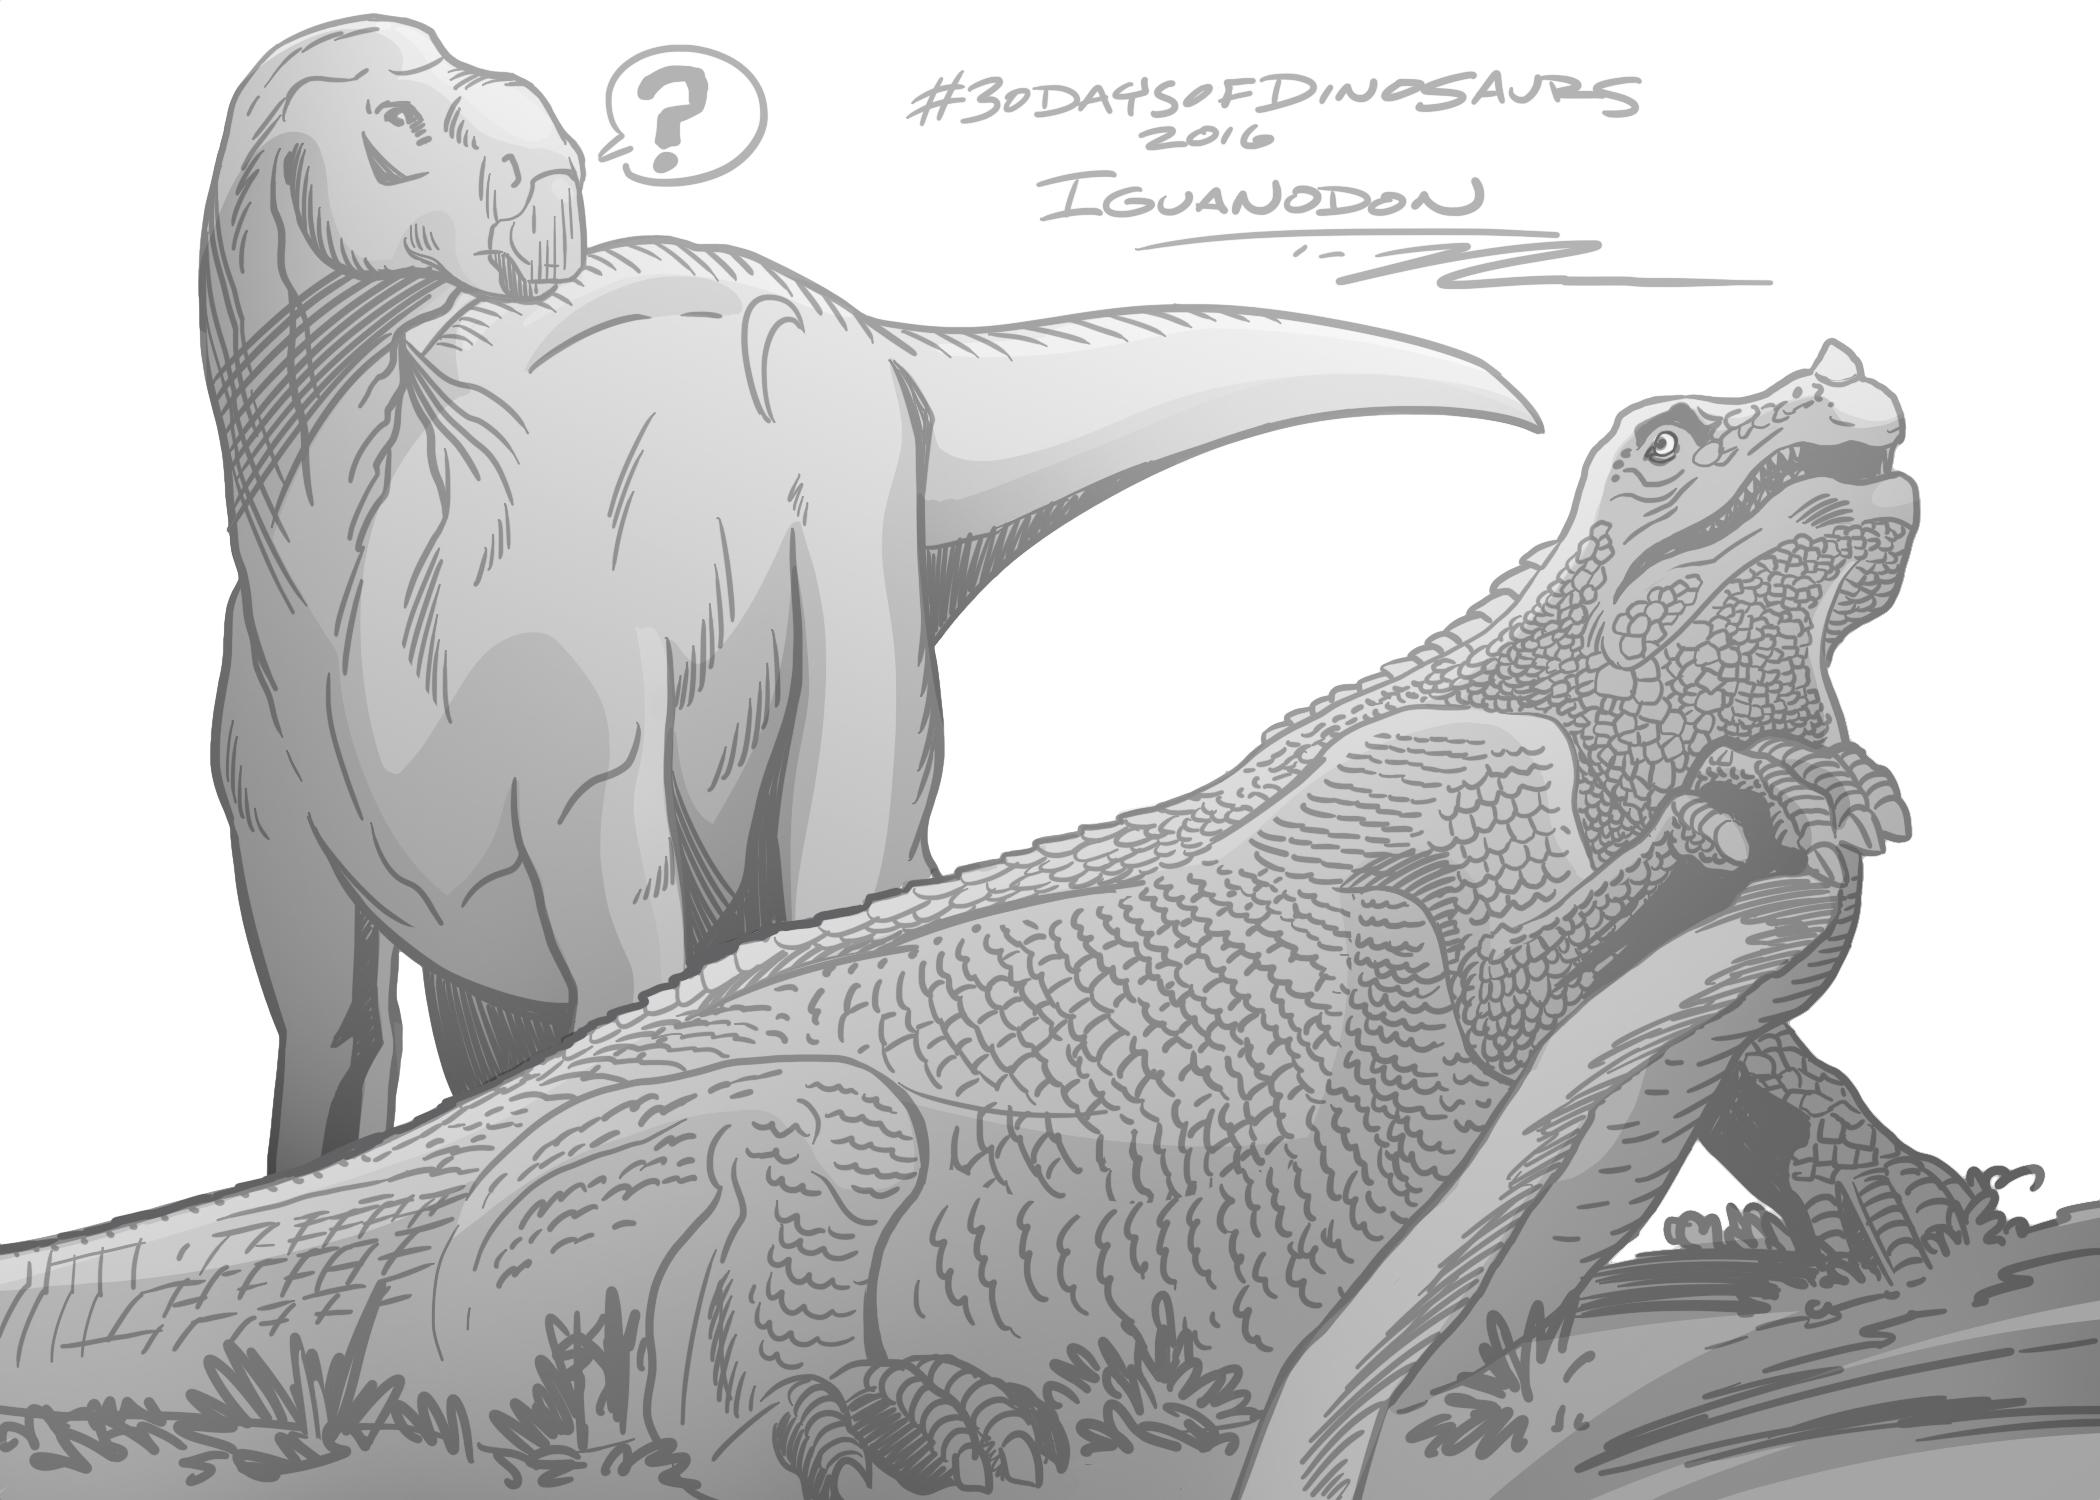 IguanodonTedRechlin